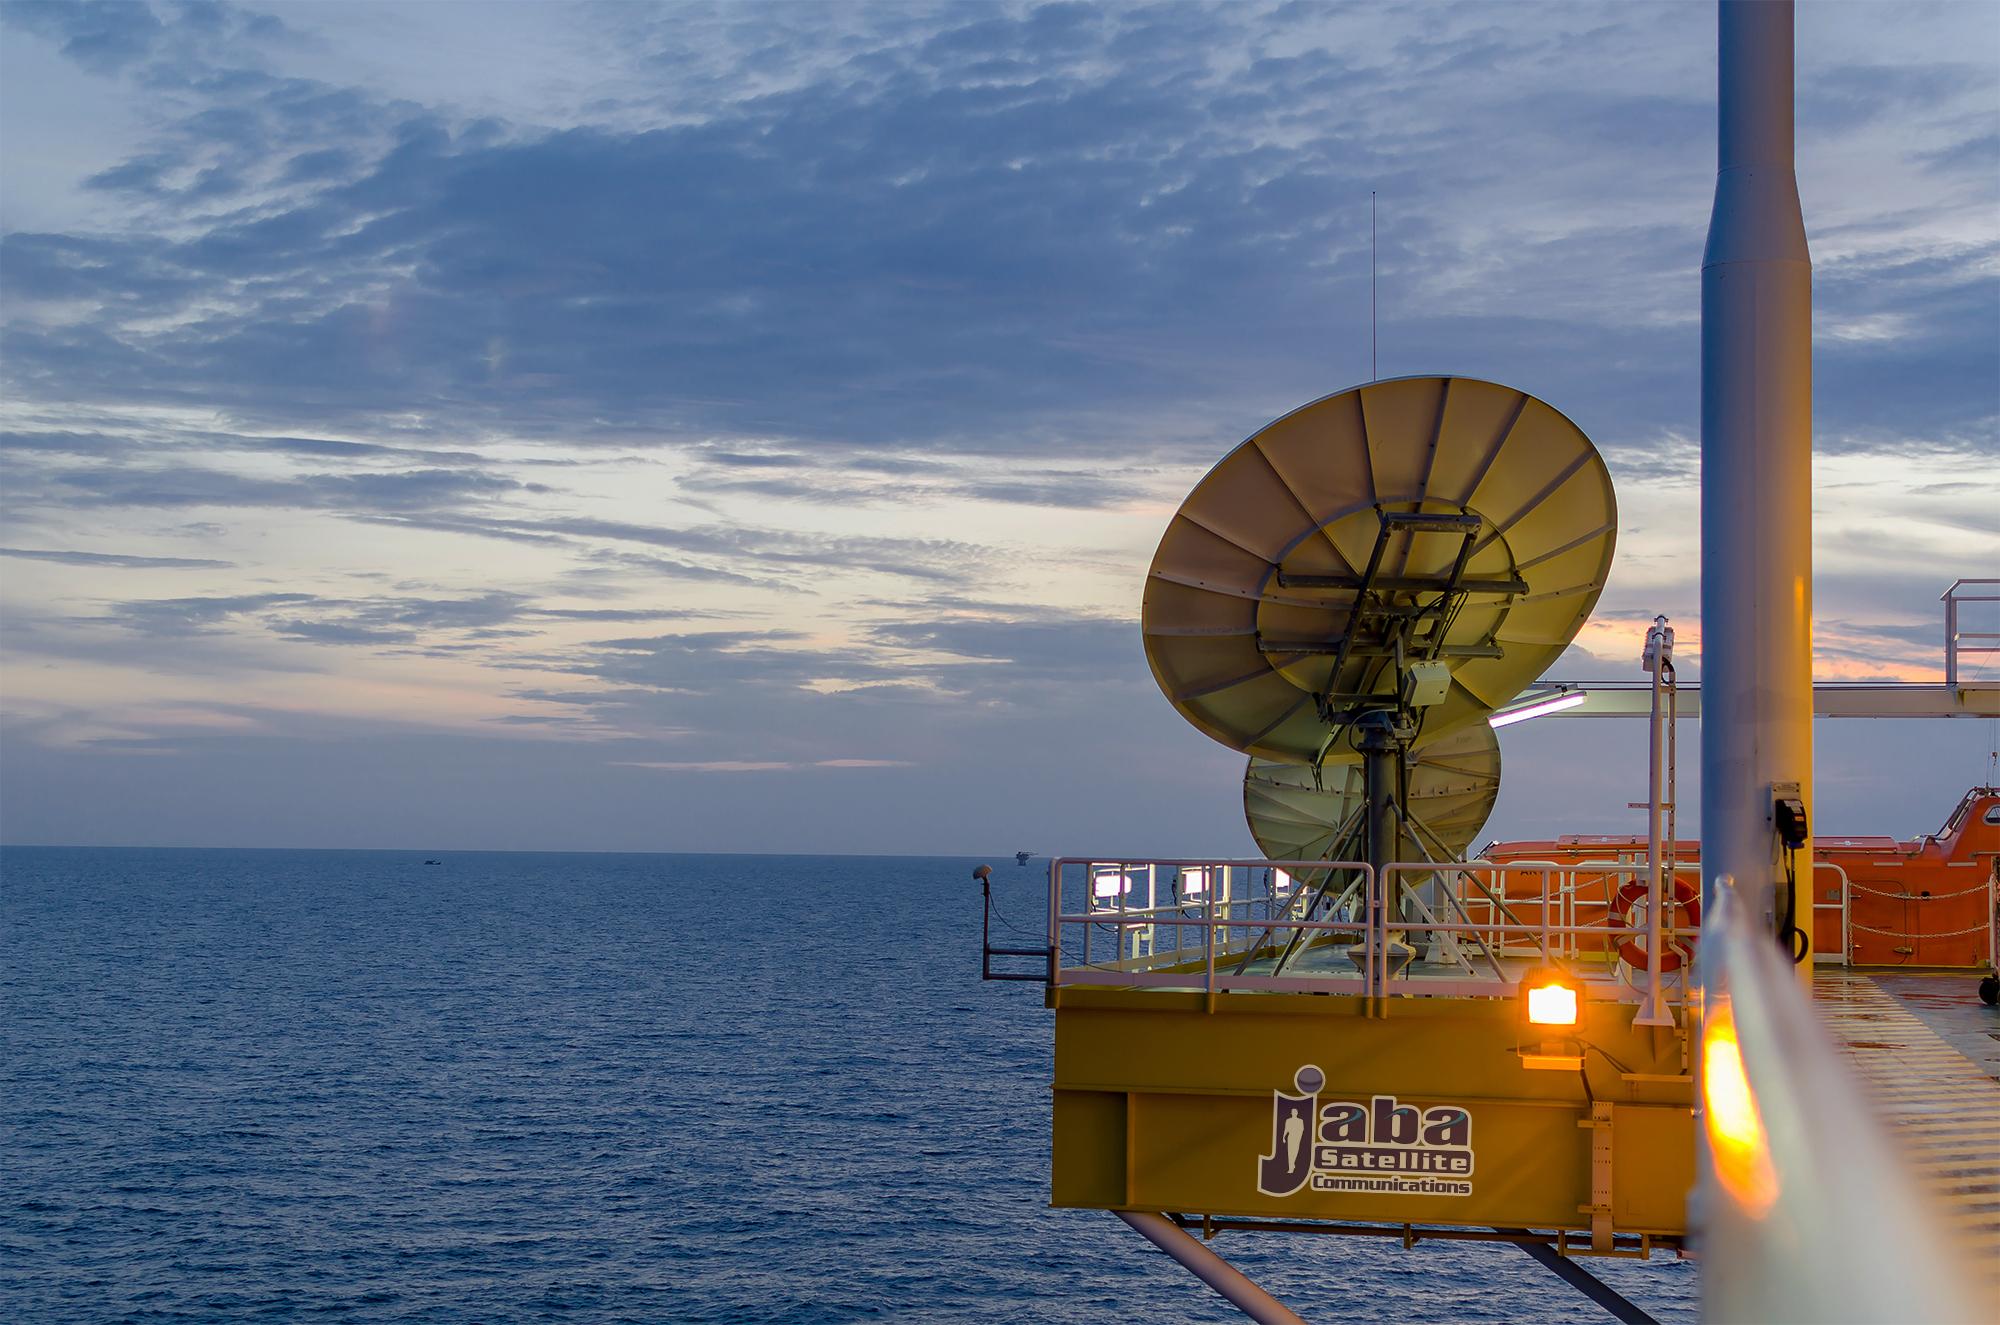 jabasat internet offshore communications